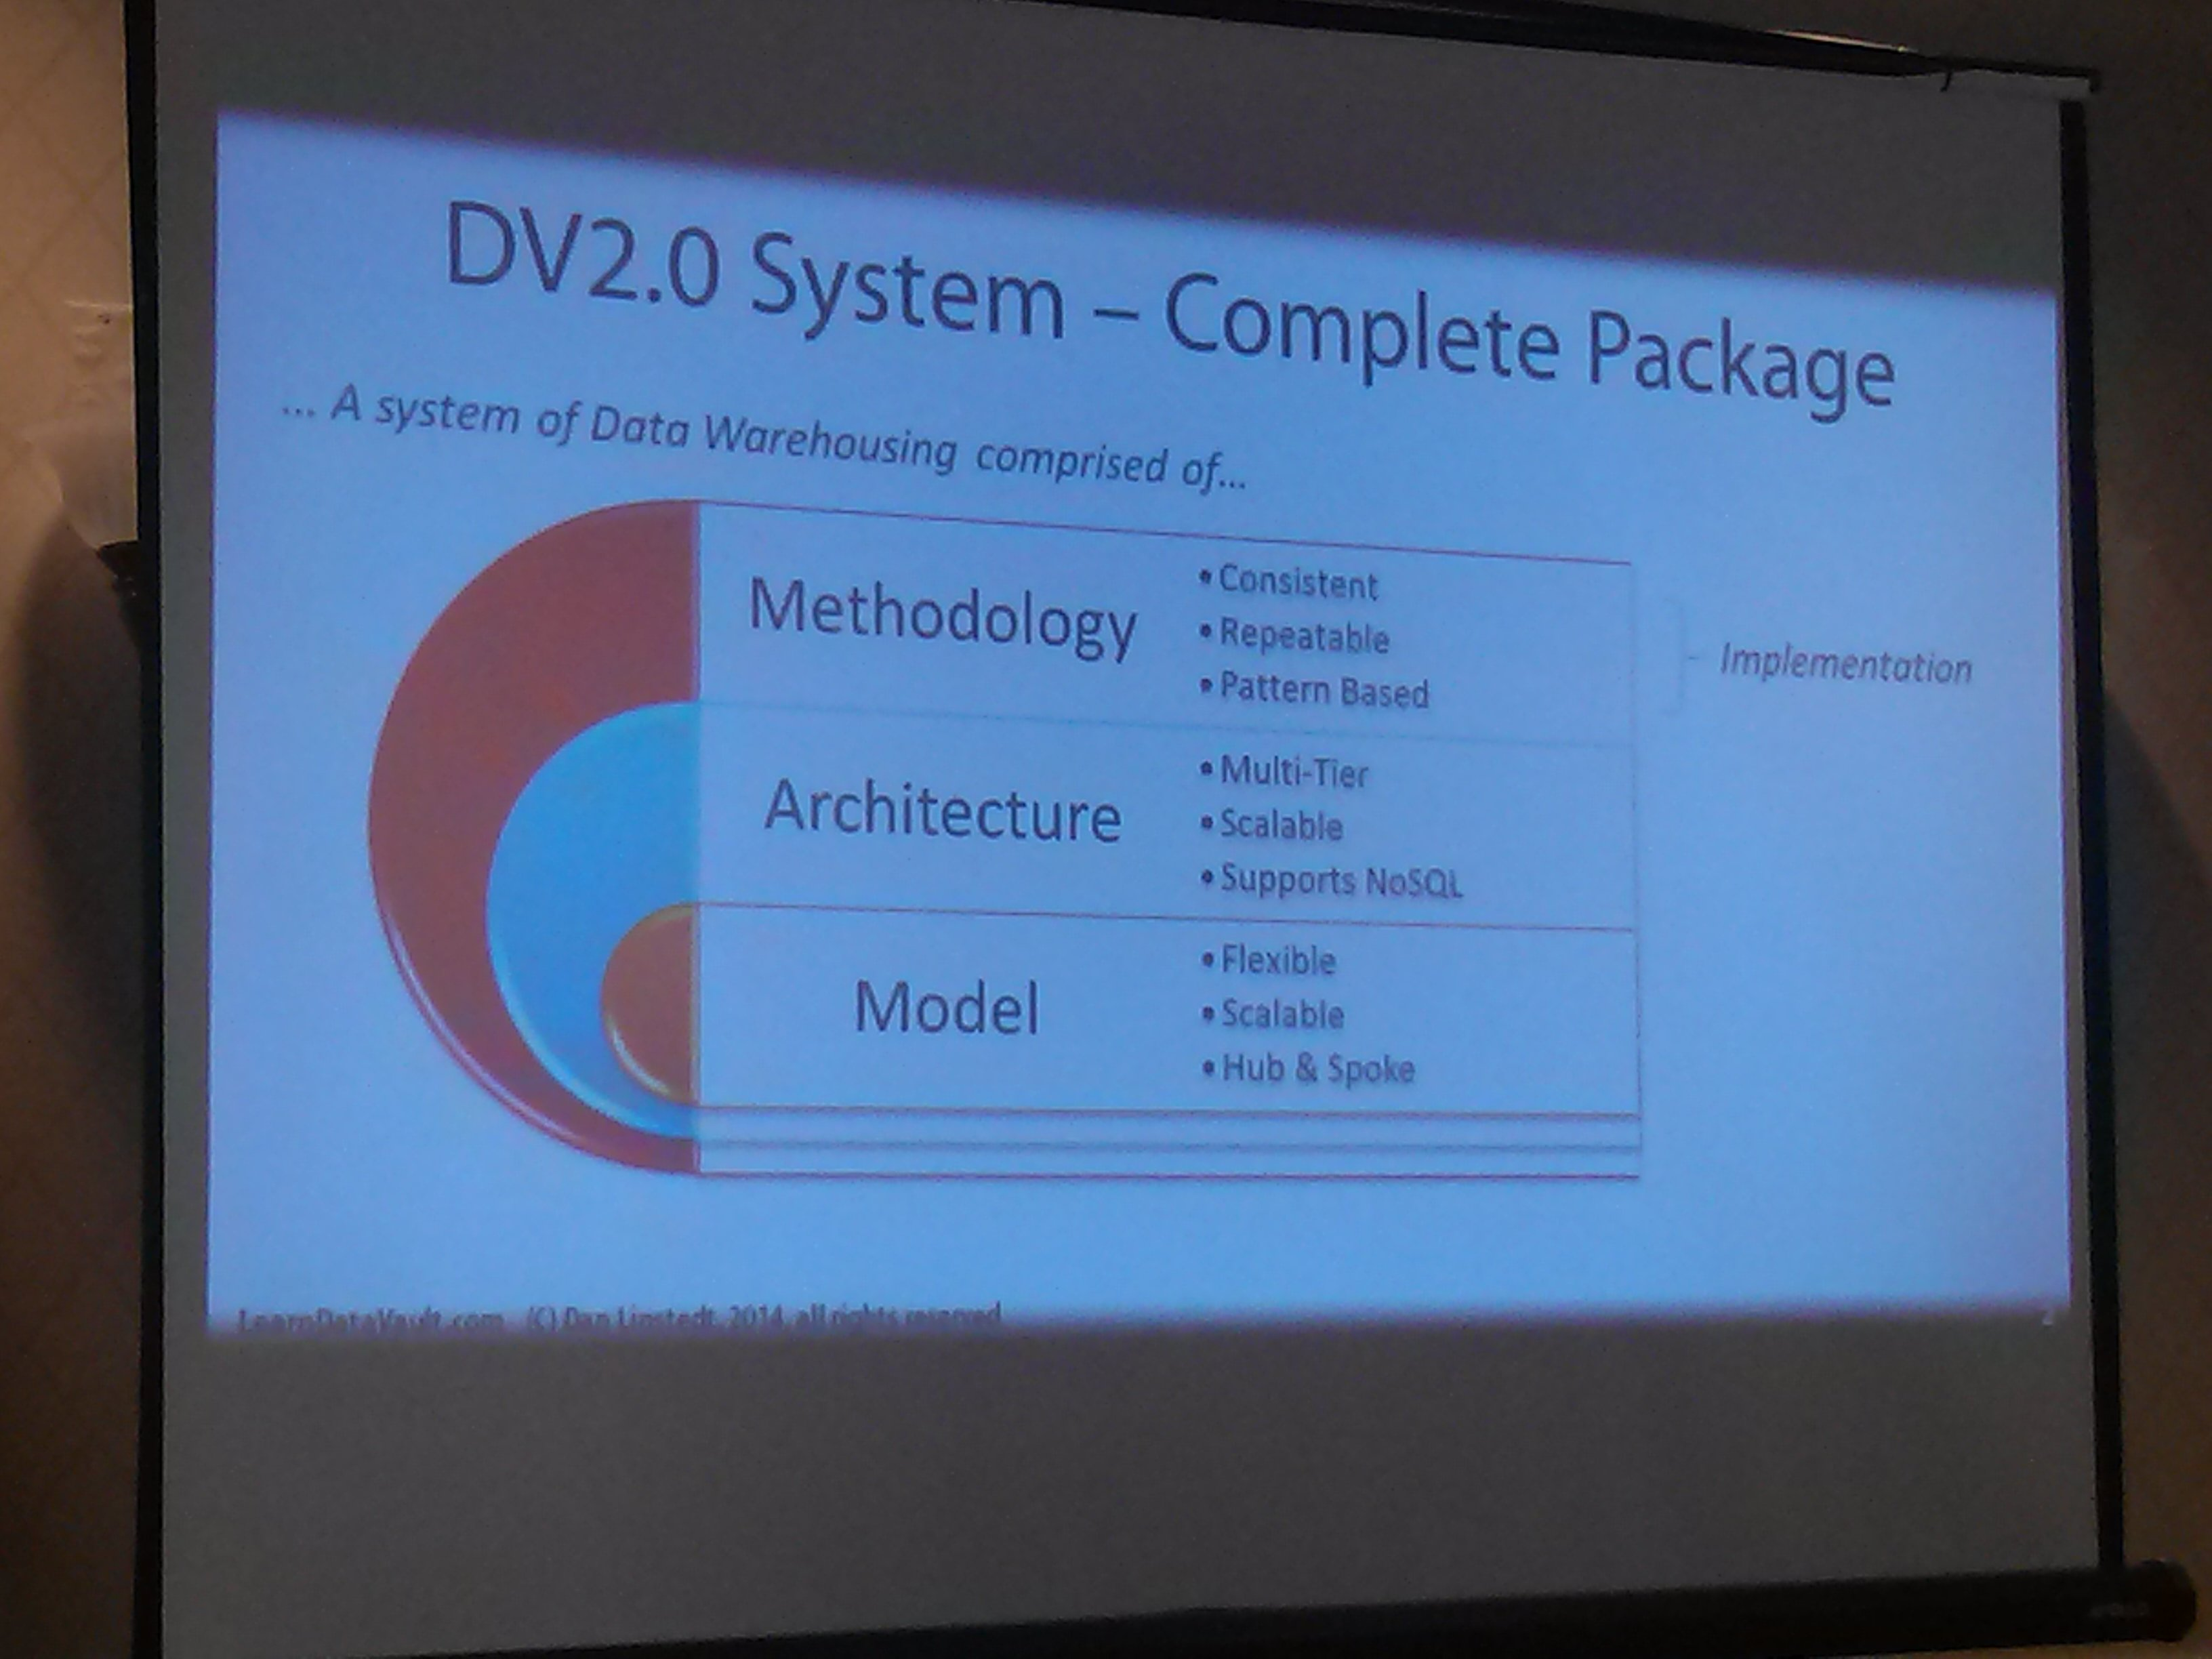 developing a data warehouse using data vault 2.0 pdf